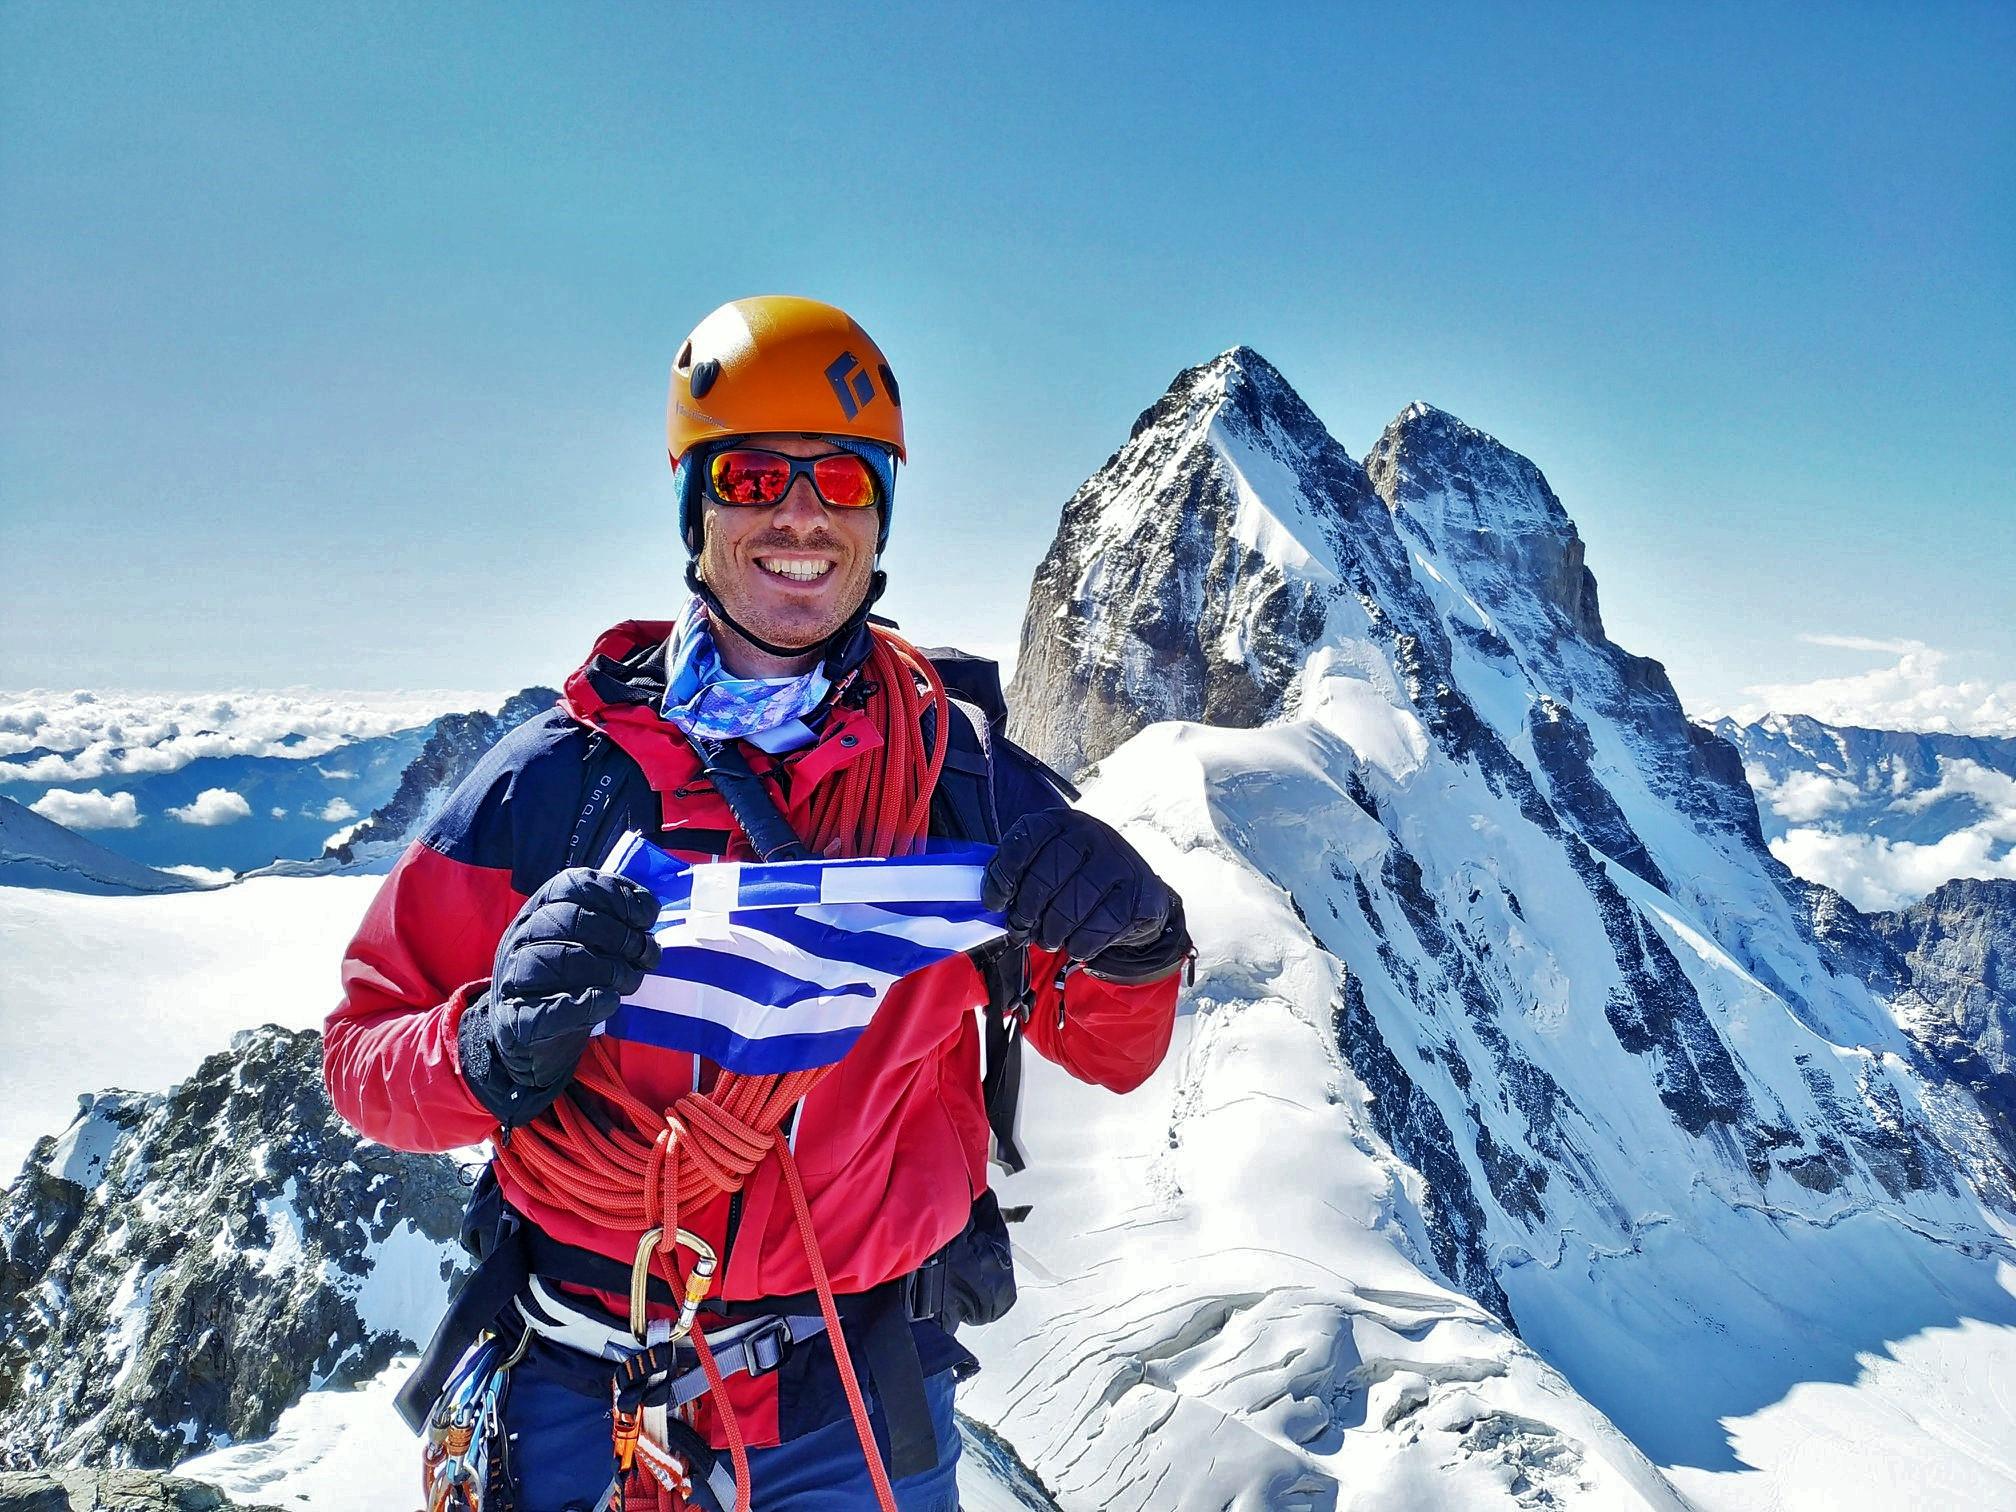 K2 & Broad Peak Greek Expedition 2021: Η επόμενη αποστολή του Φώτη Θεοχάρη